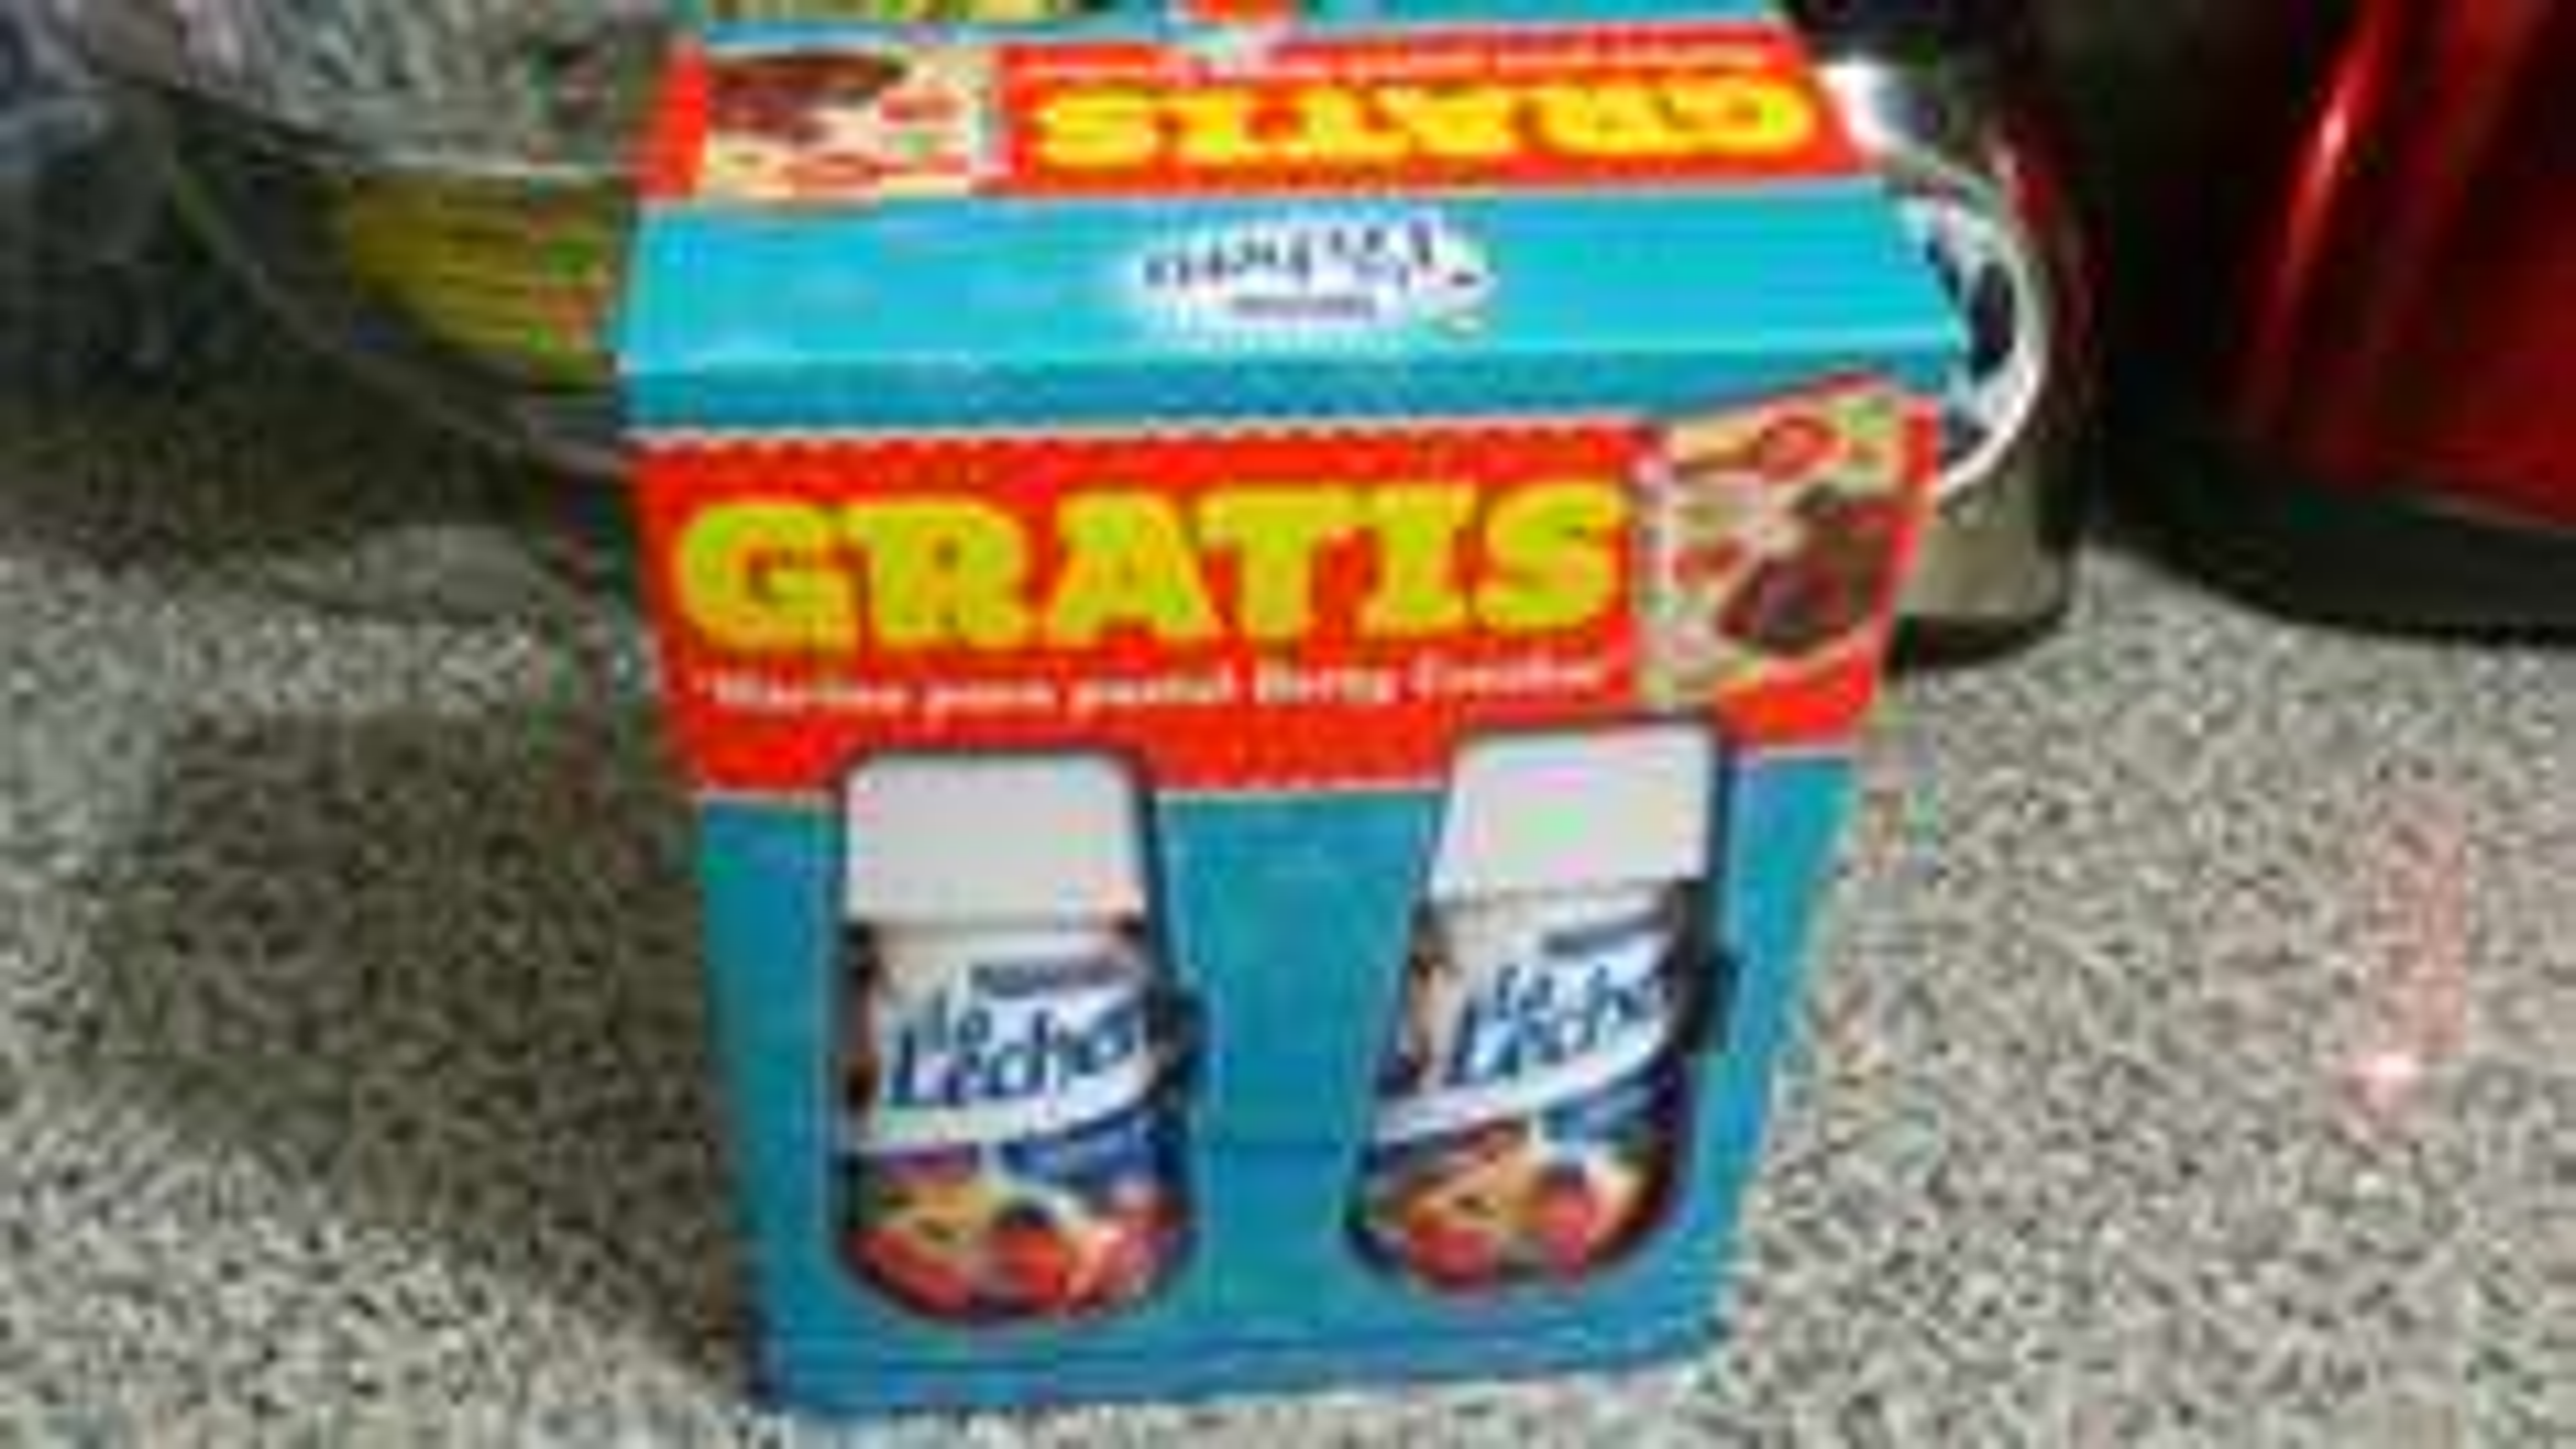 Walmart: 2 Pack La Lechera sirve fácil más caja de harina para pastel Betty Crocker $37.03